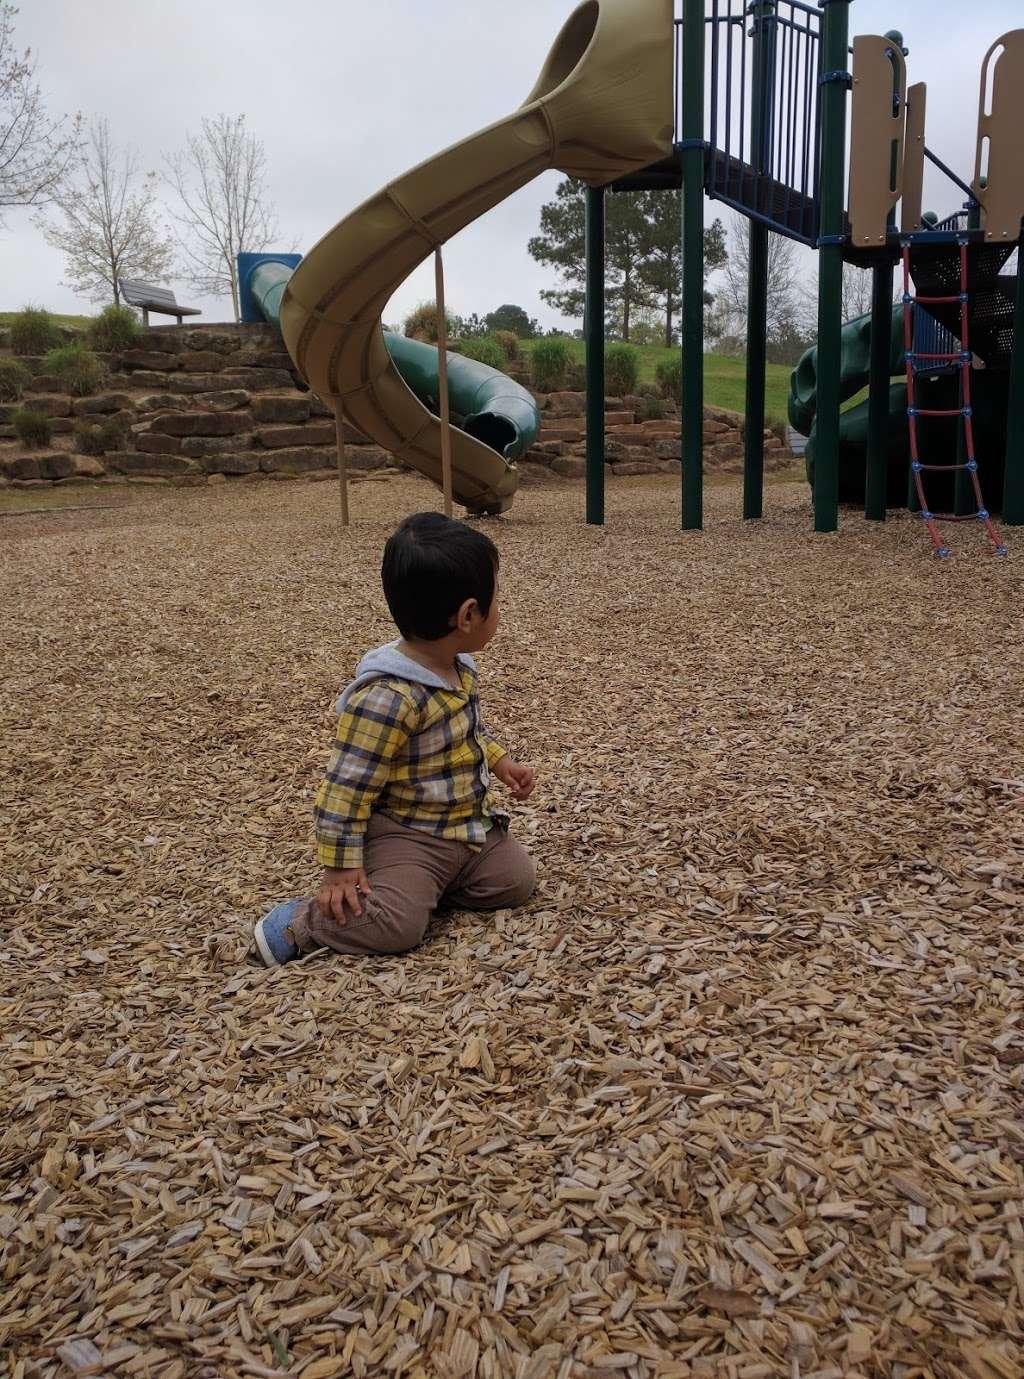 Terramont Park - park  | Photo 9 of 10 | Address: 8500 Terramont Dr, The Woodlands, TX 77382, USA | Phone: (281) 210-3800